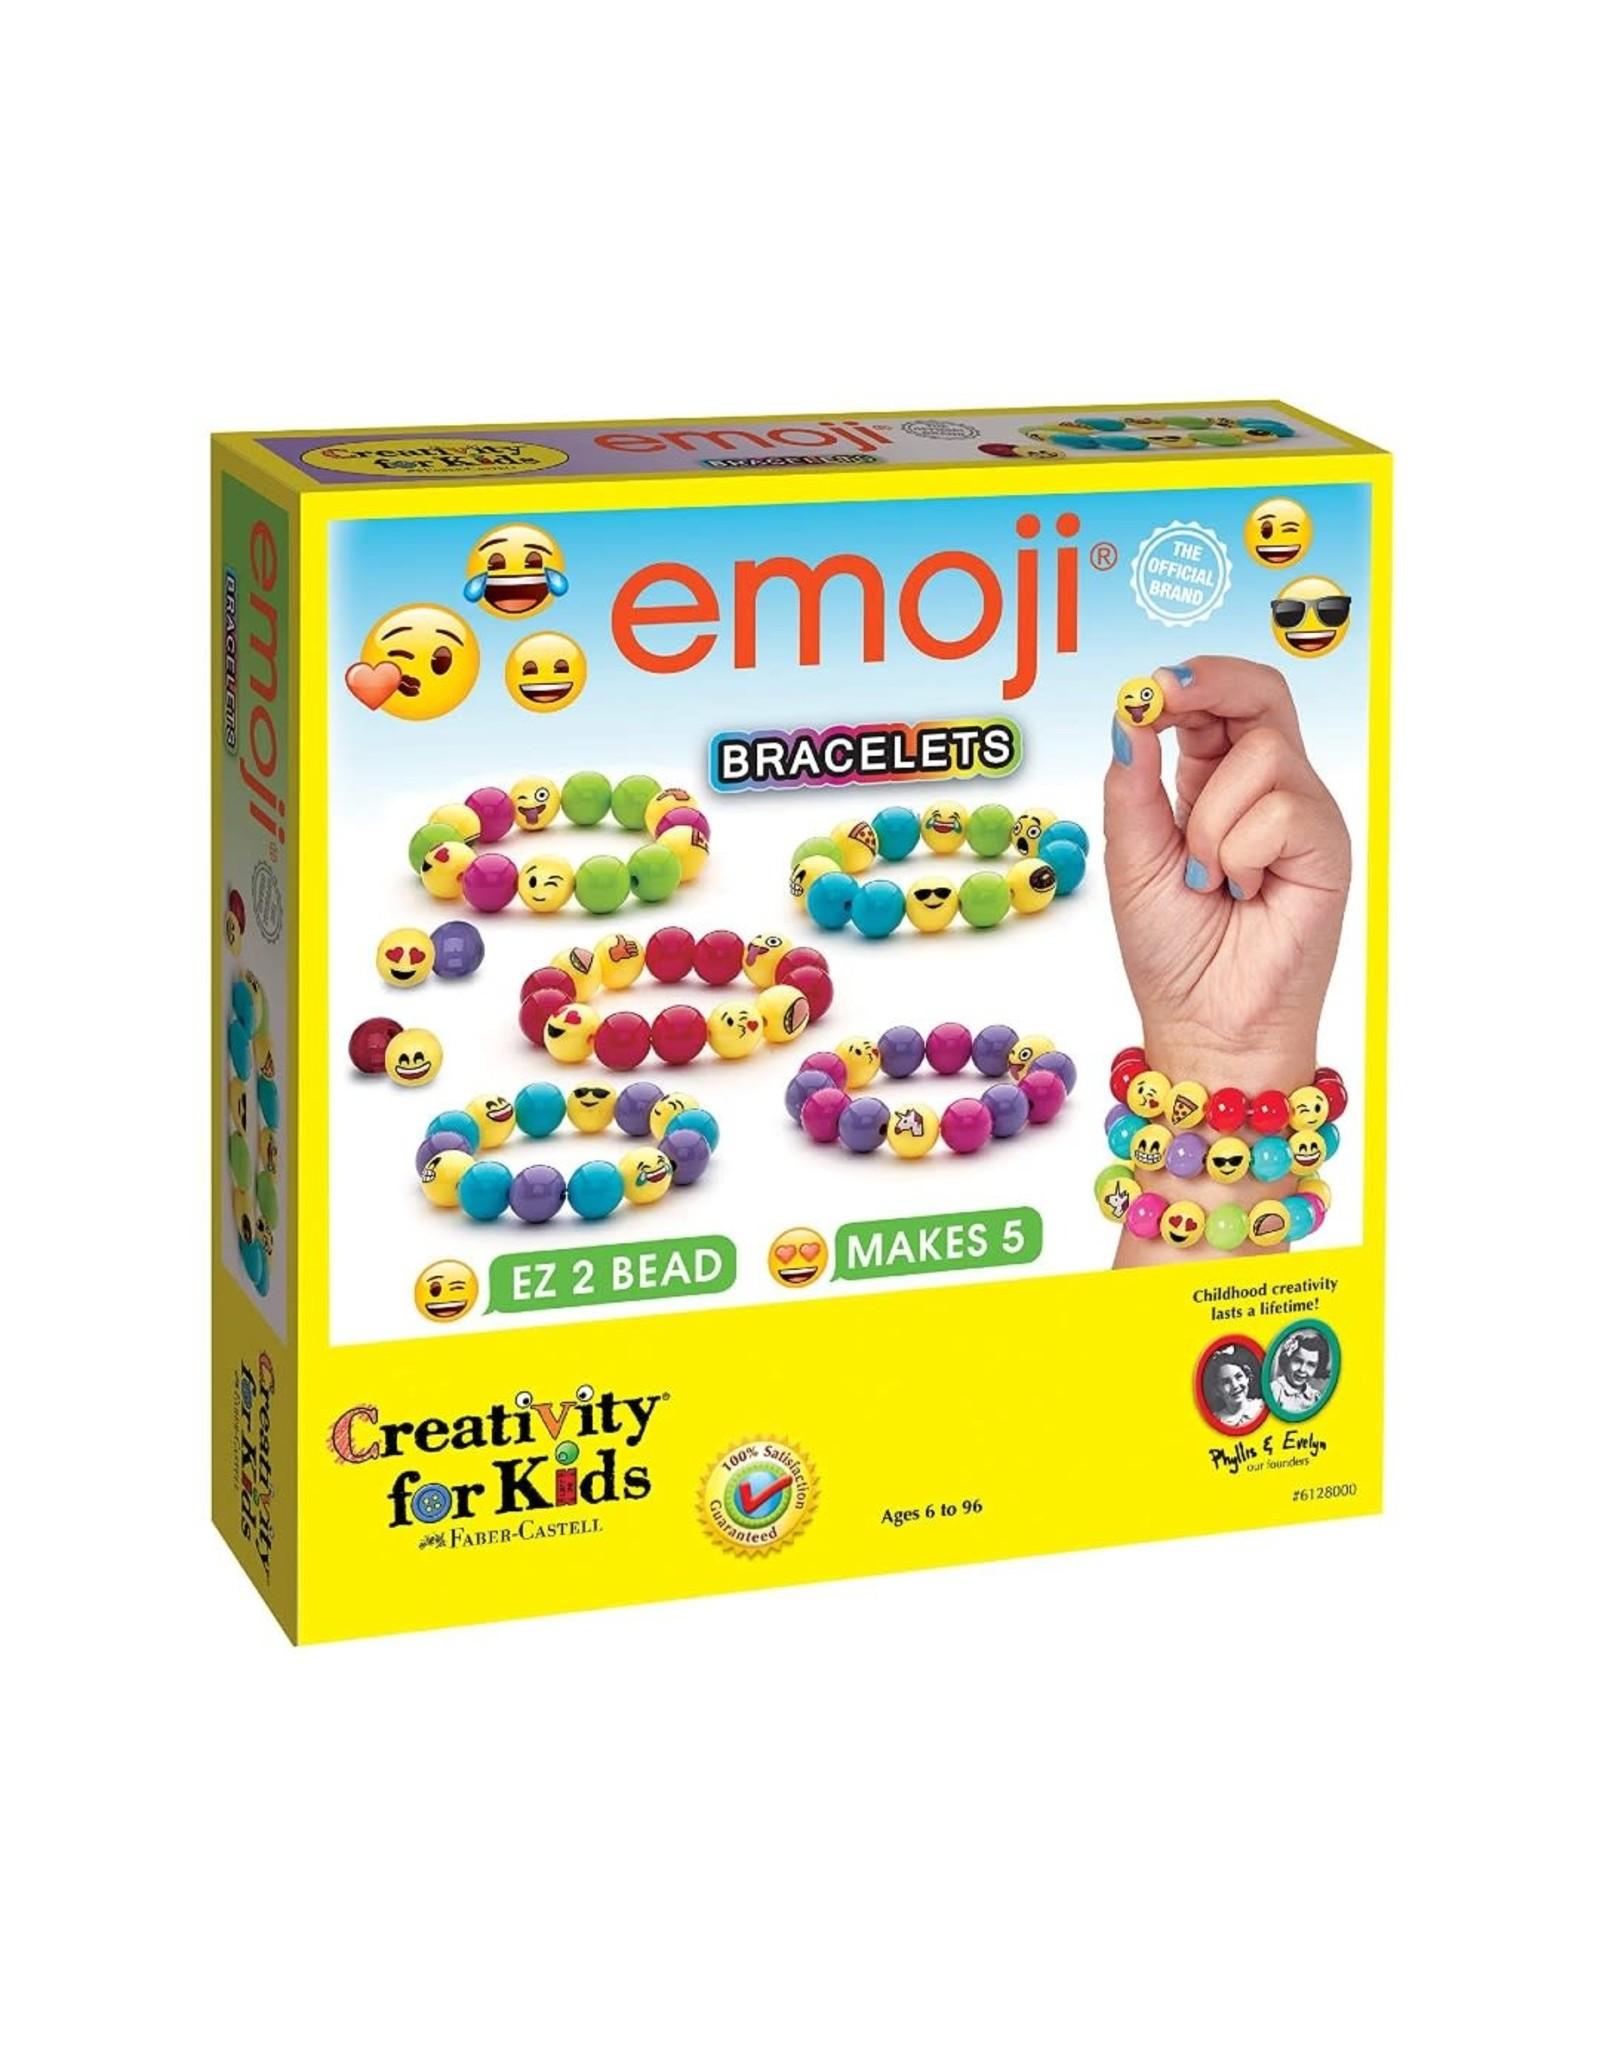 Creativity for Kids emoji' Bracelets